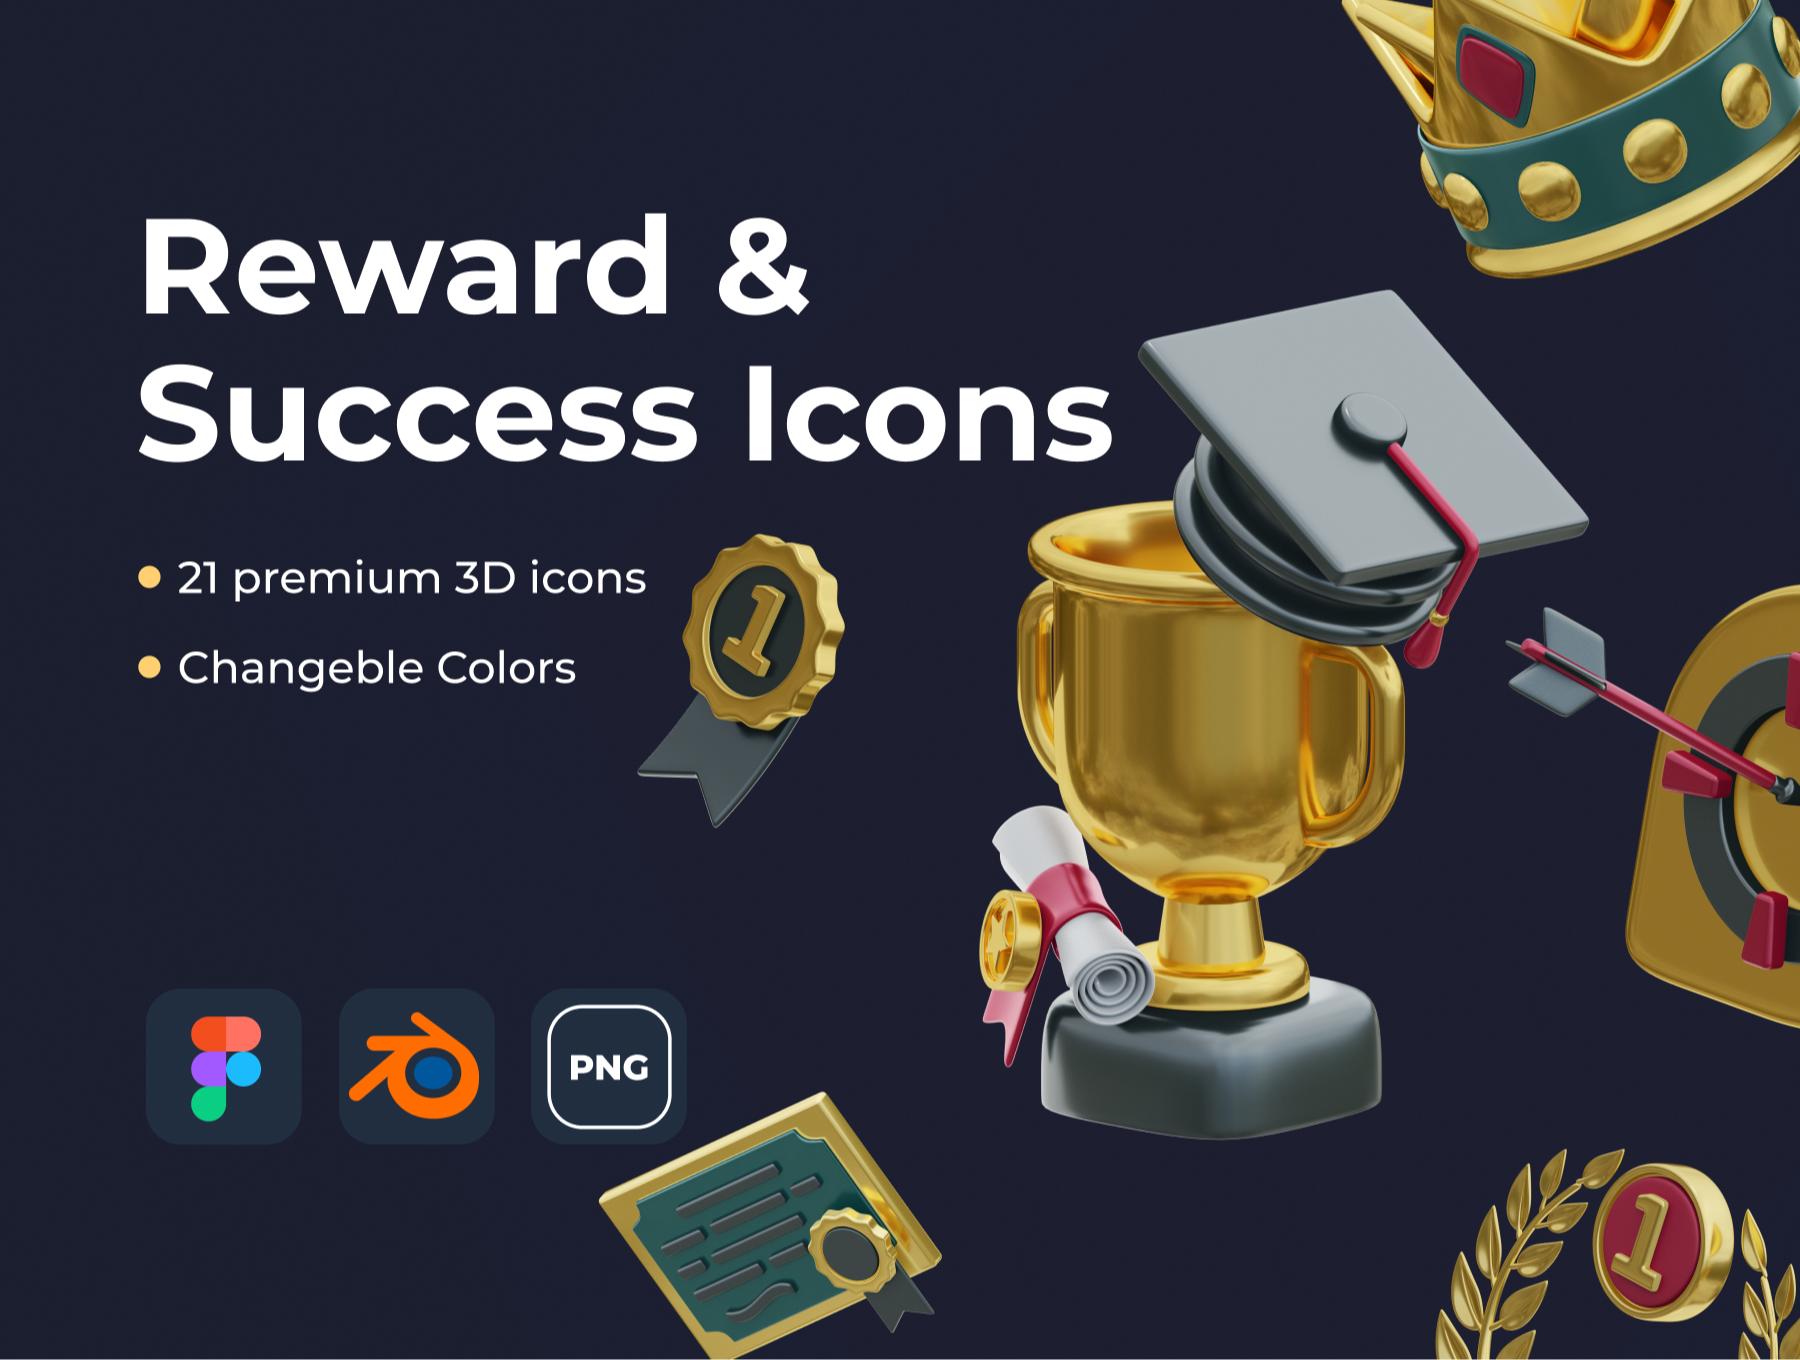 [VIP] Reward & Success Icons